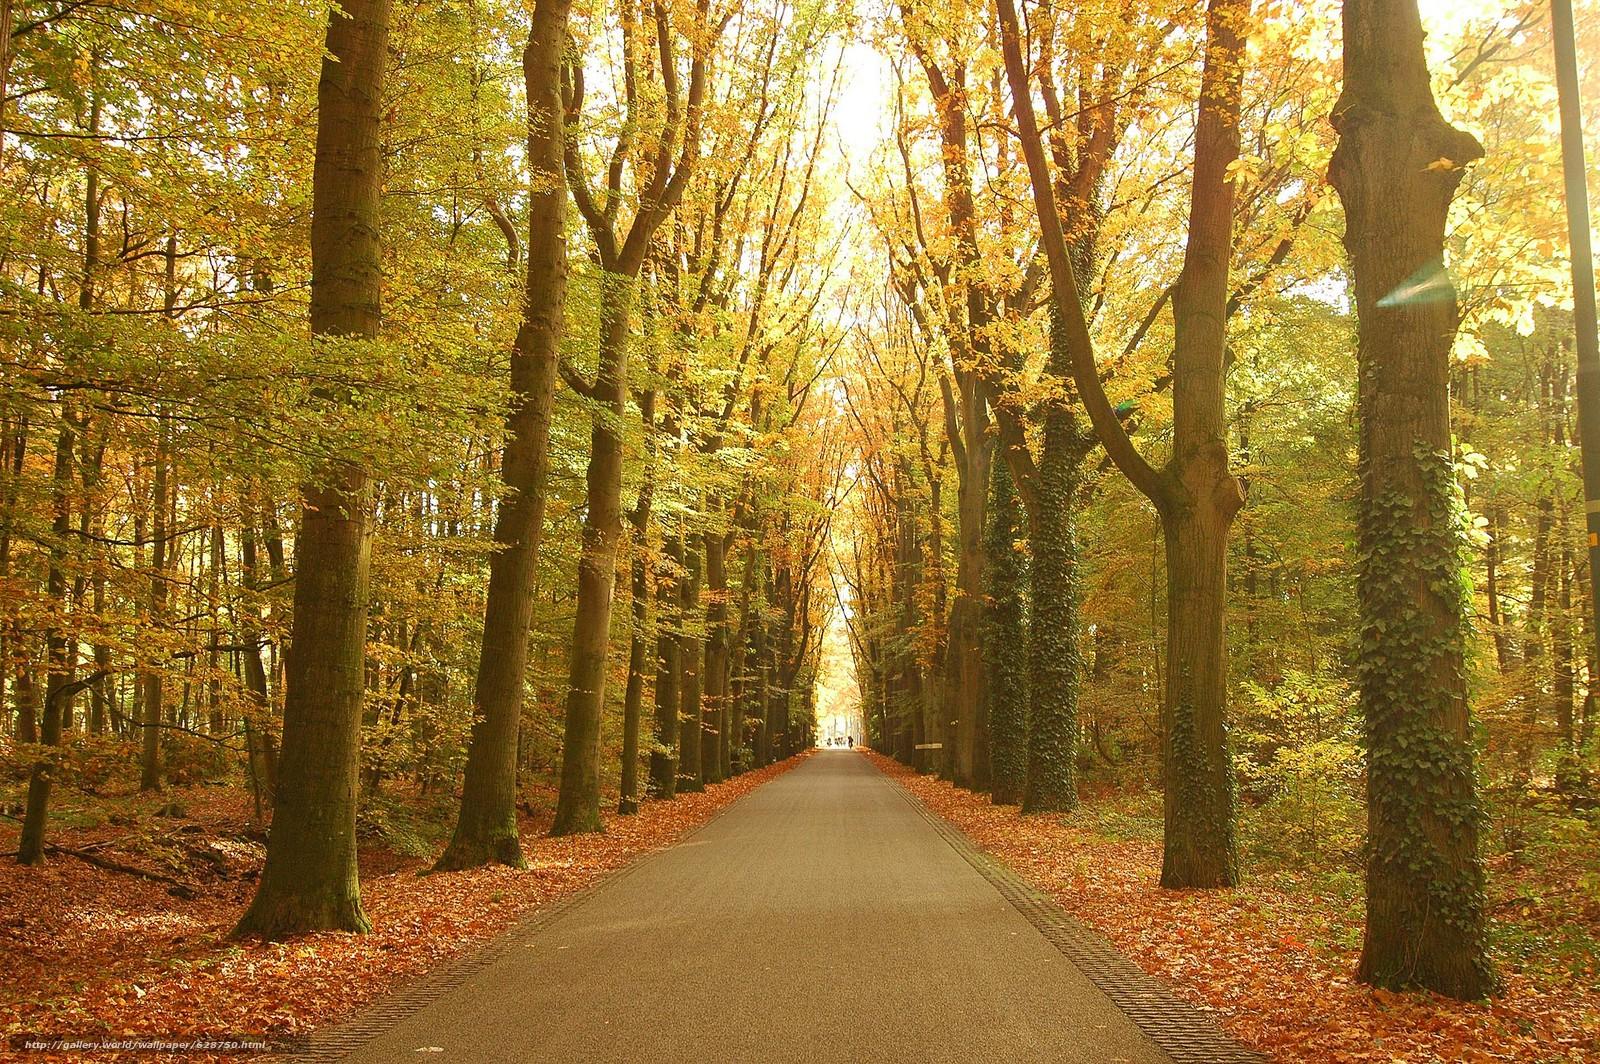 осень, парк, деревья, дорога, пейзаж